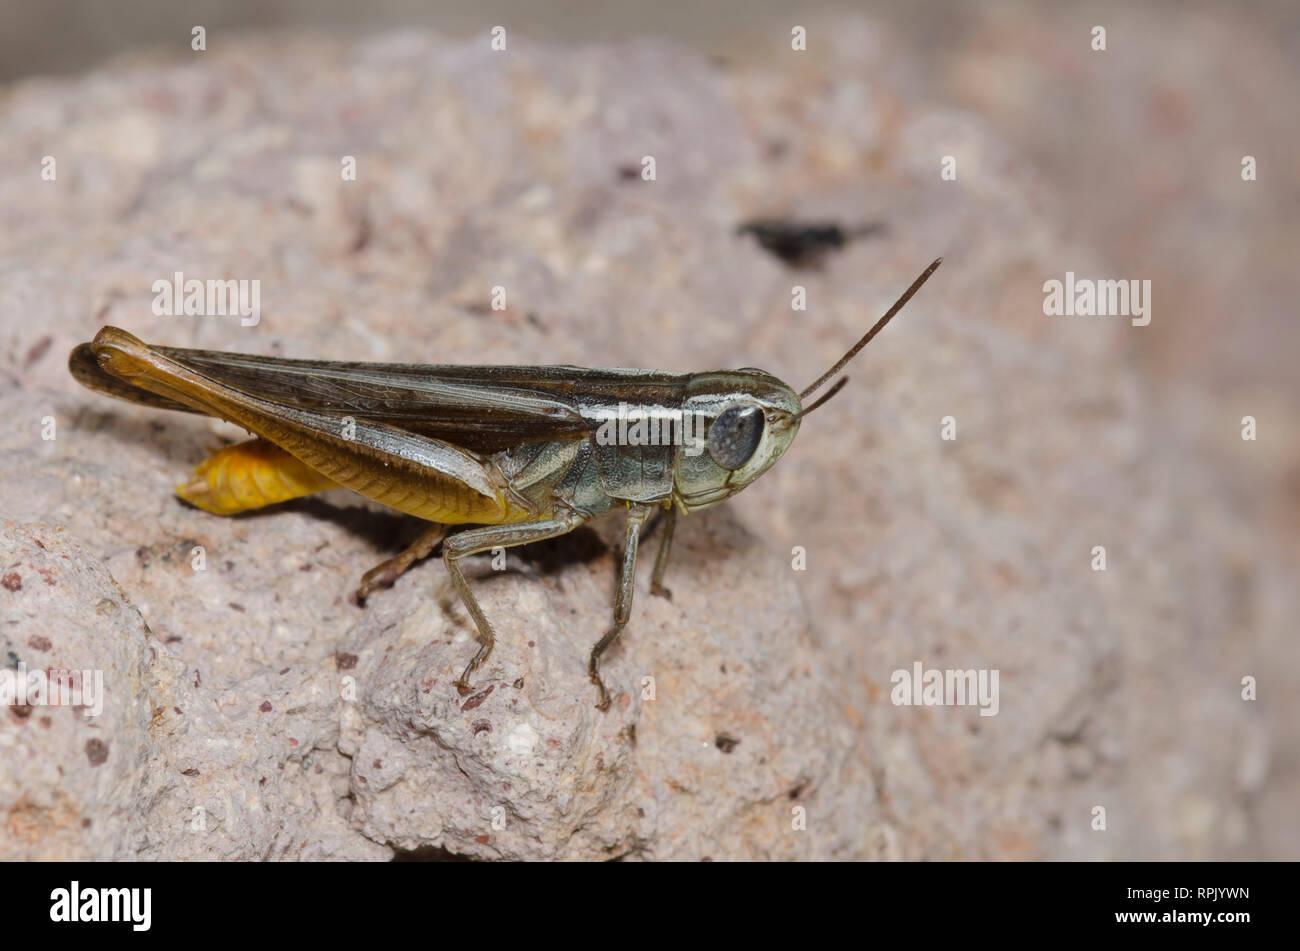 Brown Winter Grasshopper, Amblytropidia mysteca, male - Stock Image